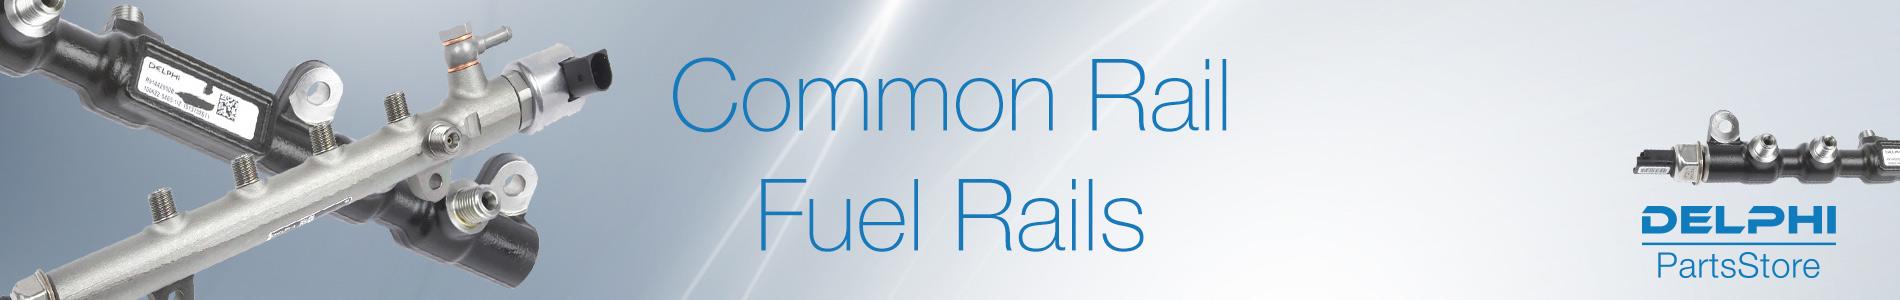 Common Rail Fuel Rails